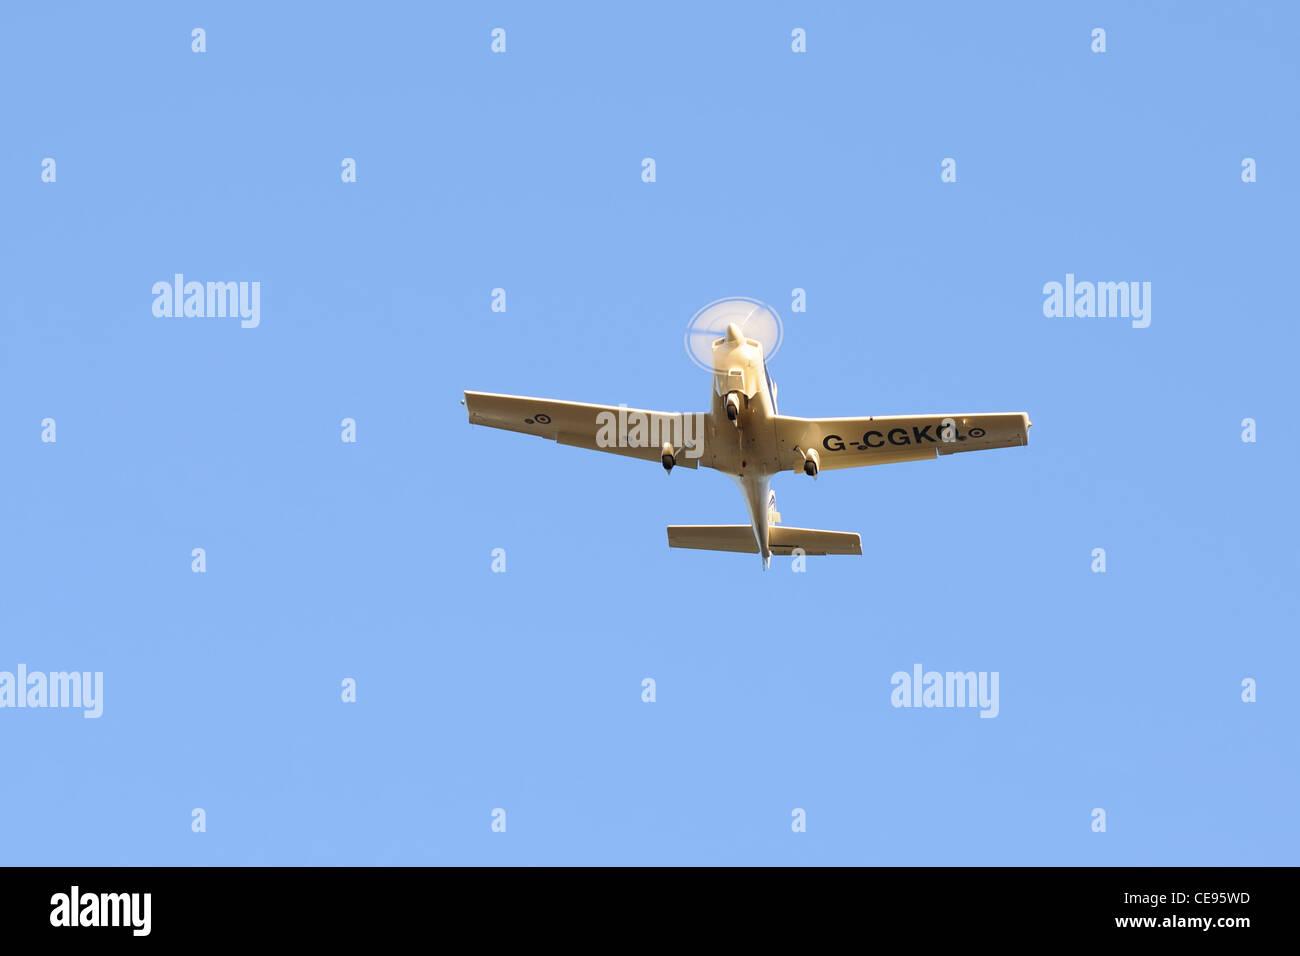 A Royal air force, VT Aerospace Grob G115 Tutor / Heron G-CGKO taken over Glasgow airport, Scotland, UK - Stock Image